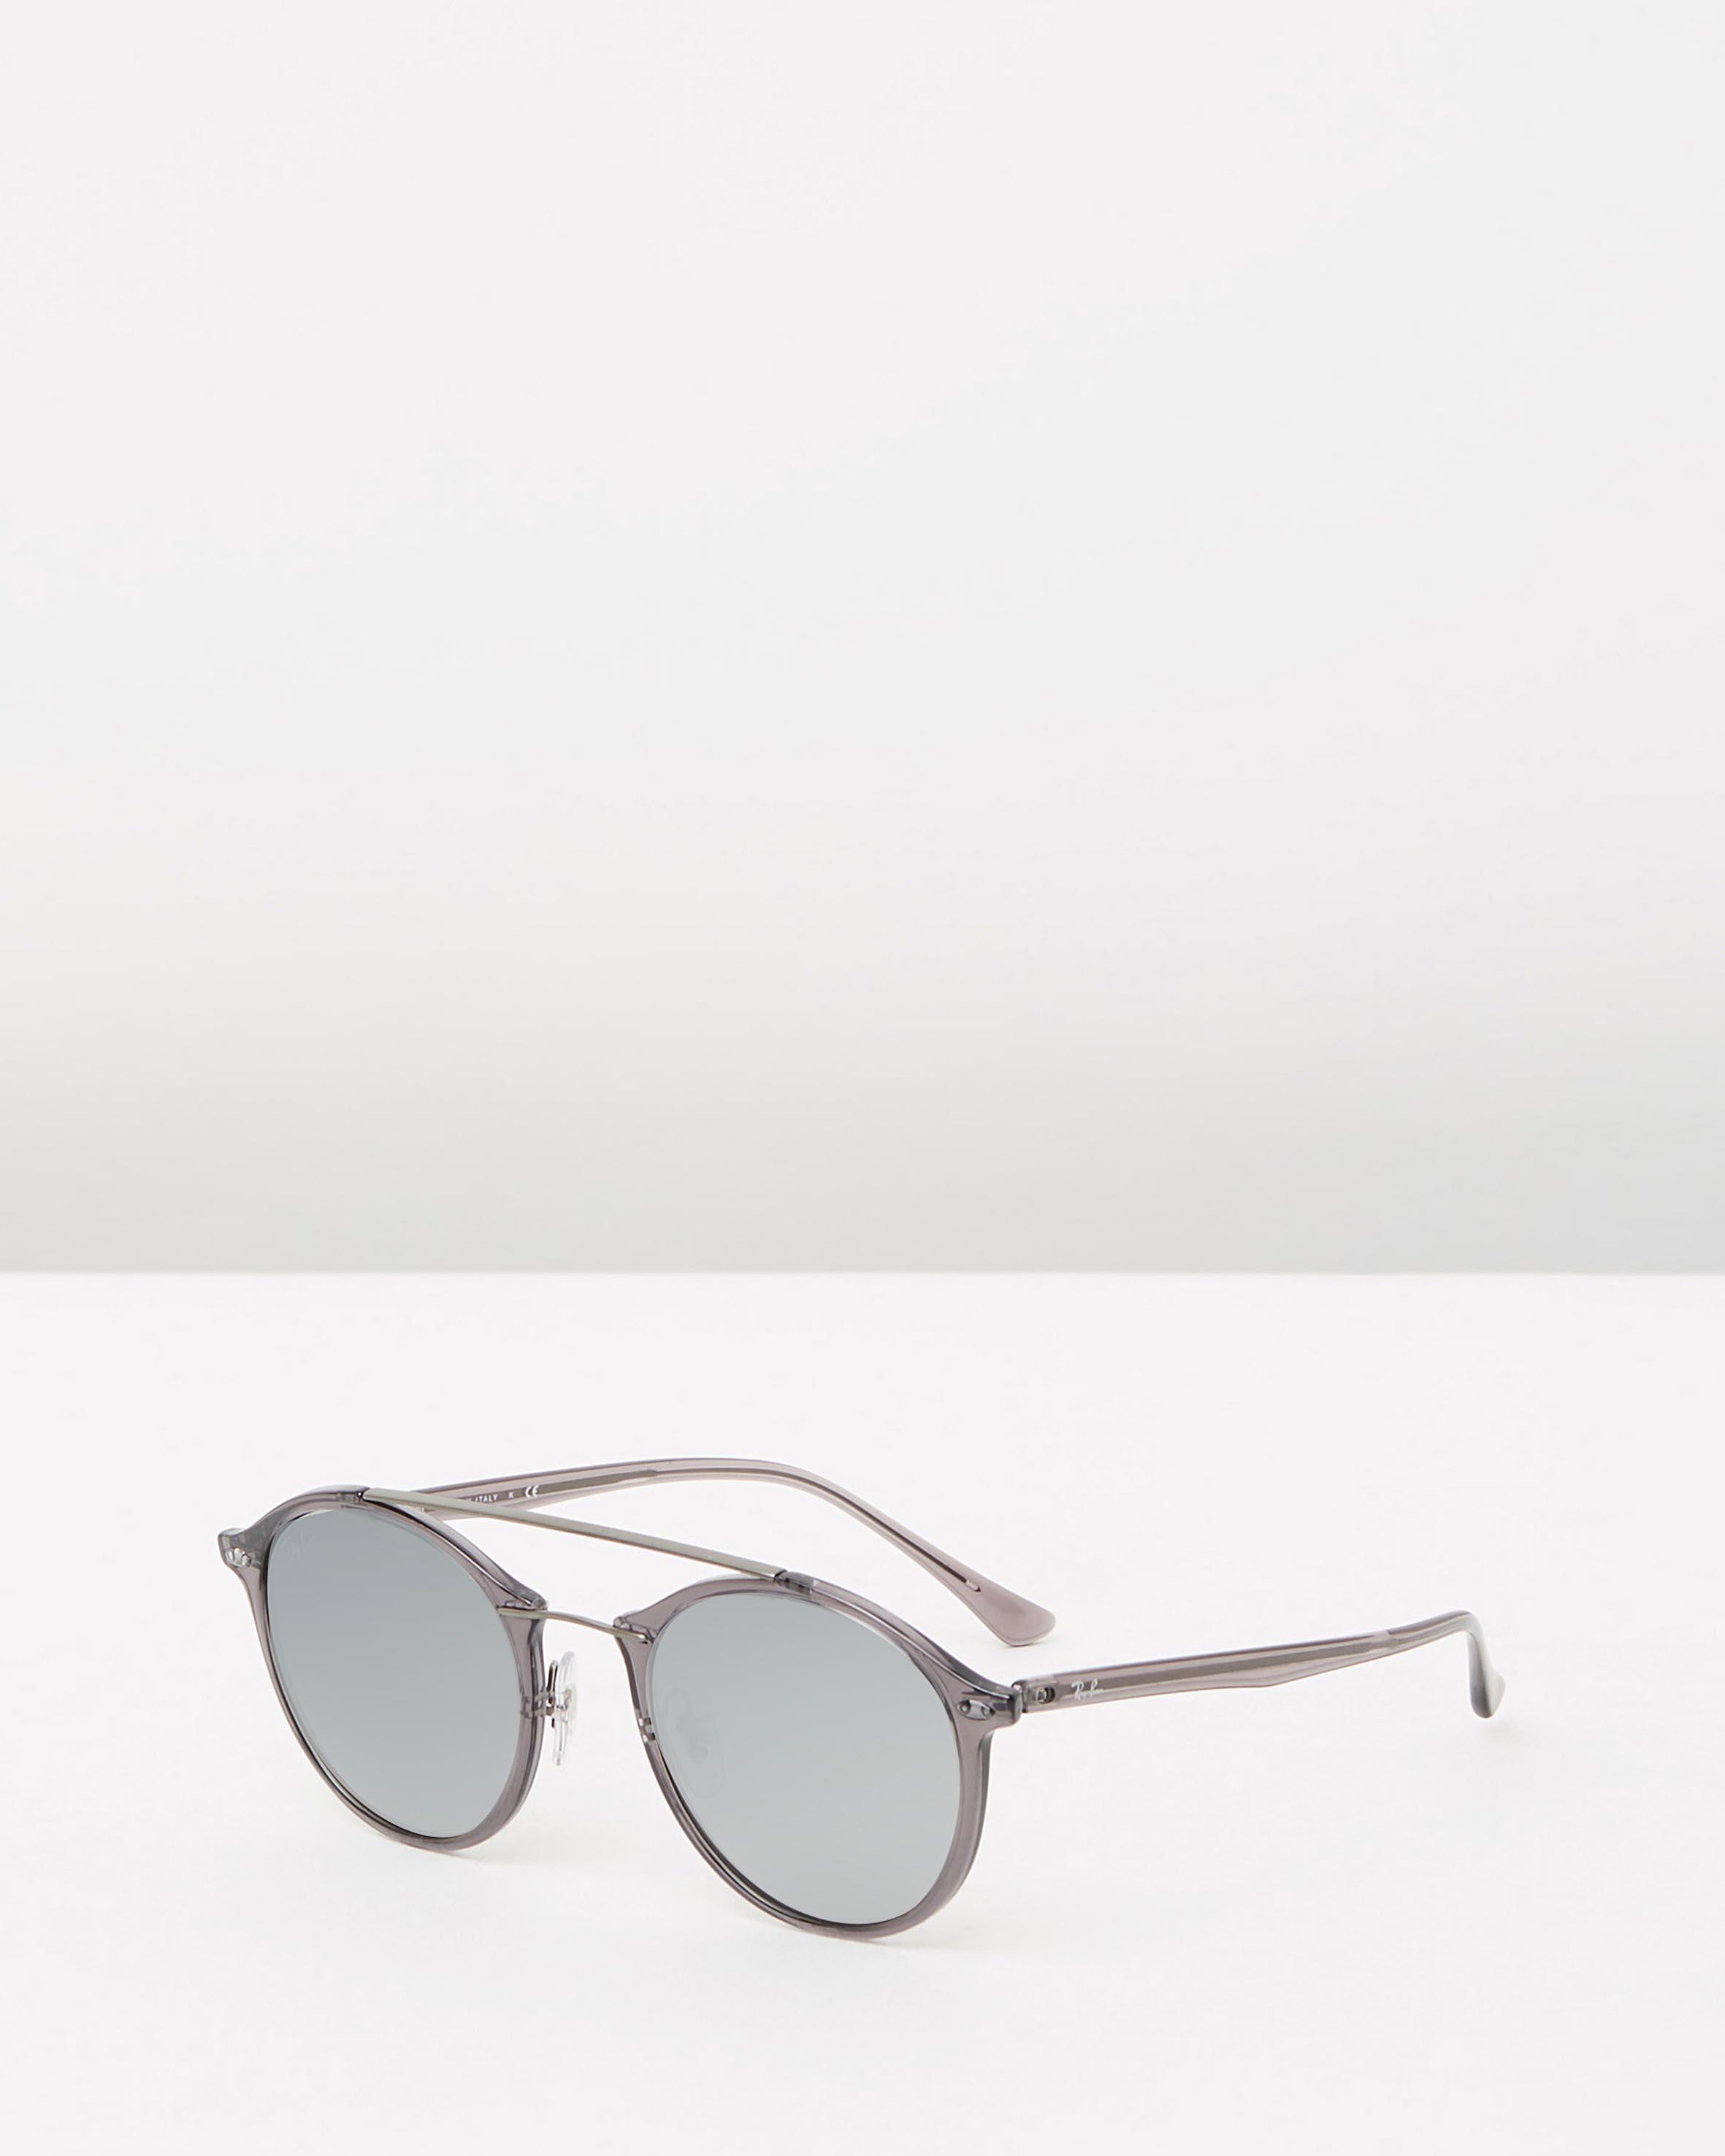 fake ray ban sunglasses australia  replica ray bans australia